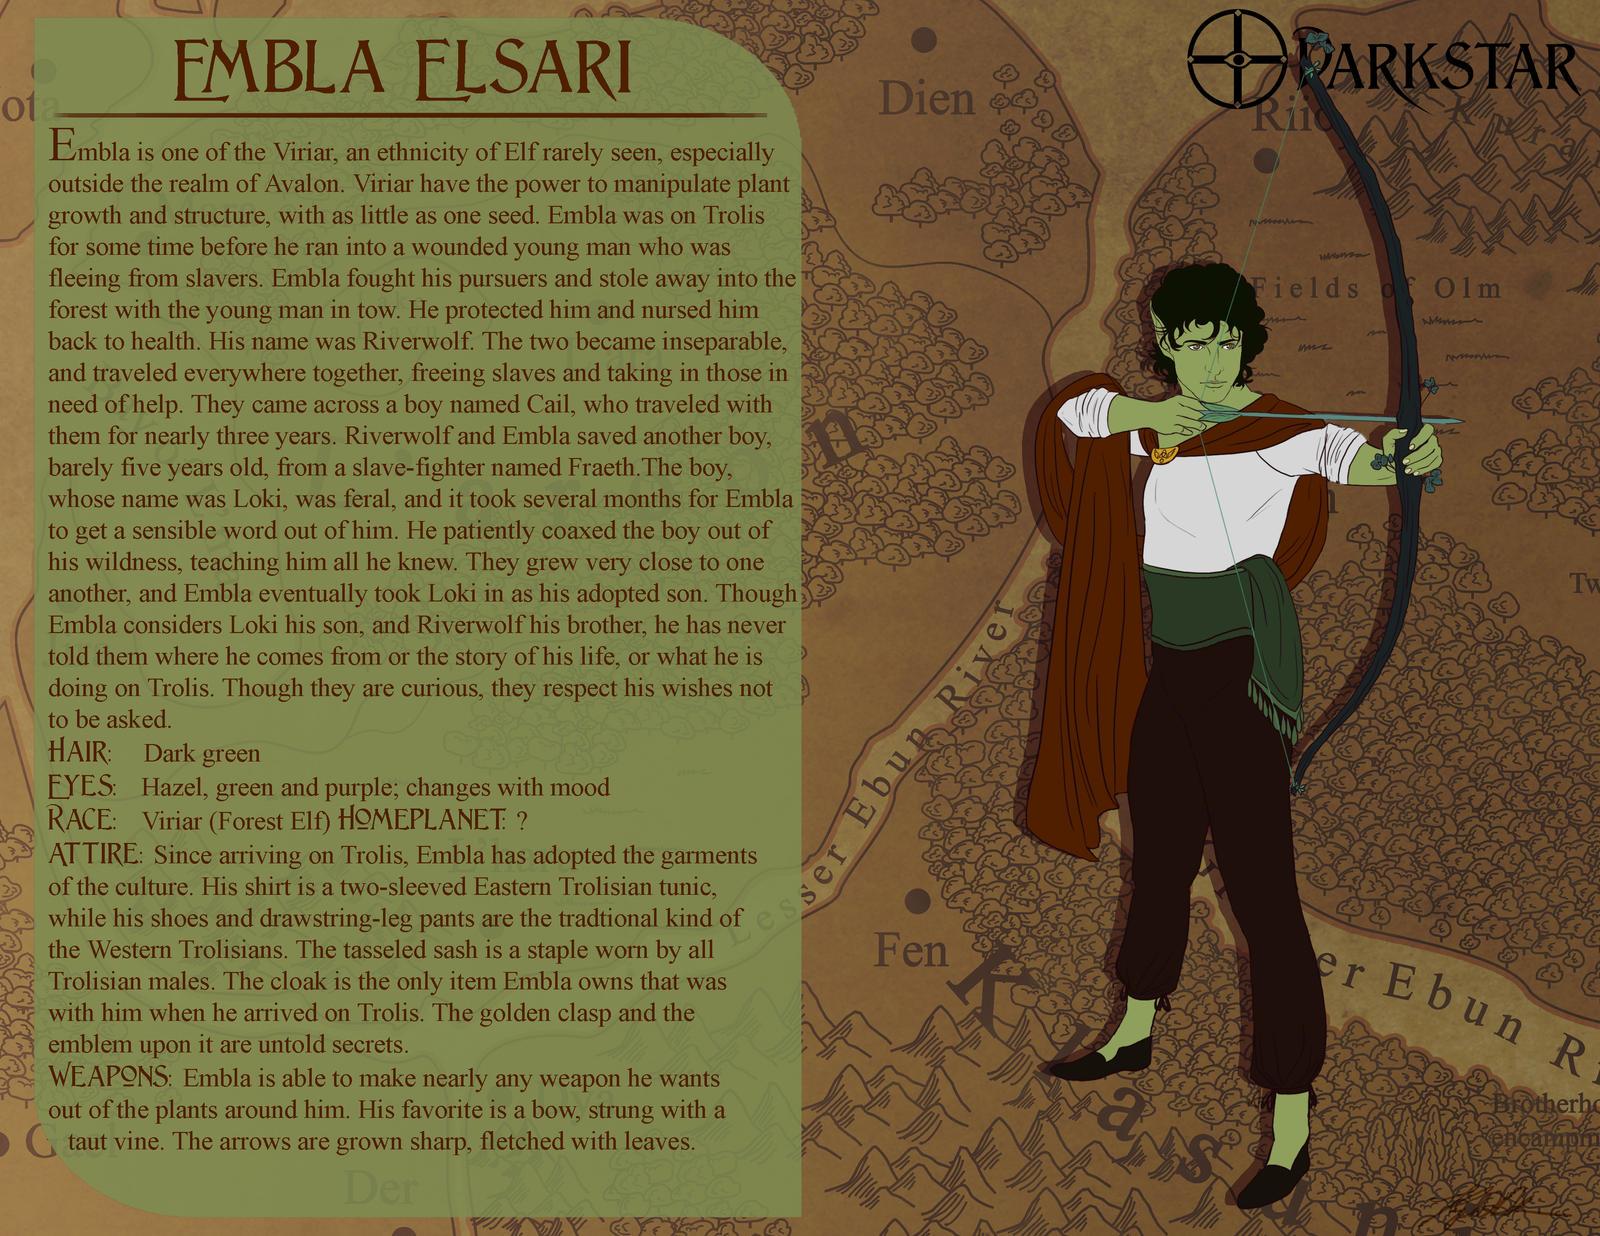 Darkstar Profiles: Embla Elsari by Silvre